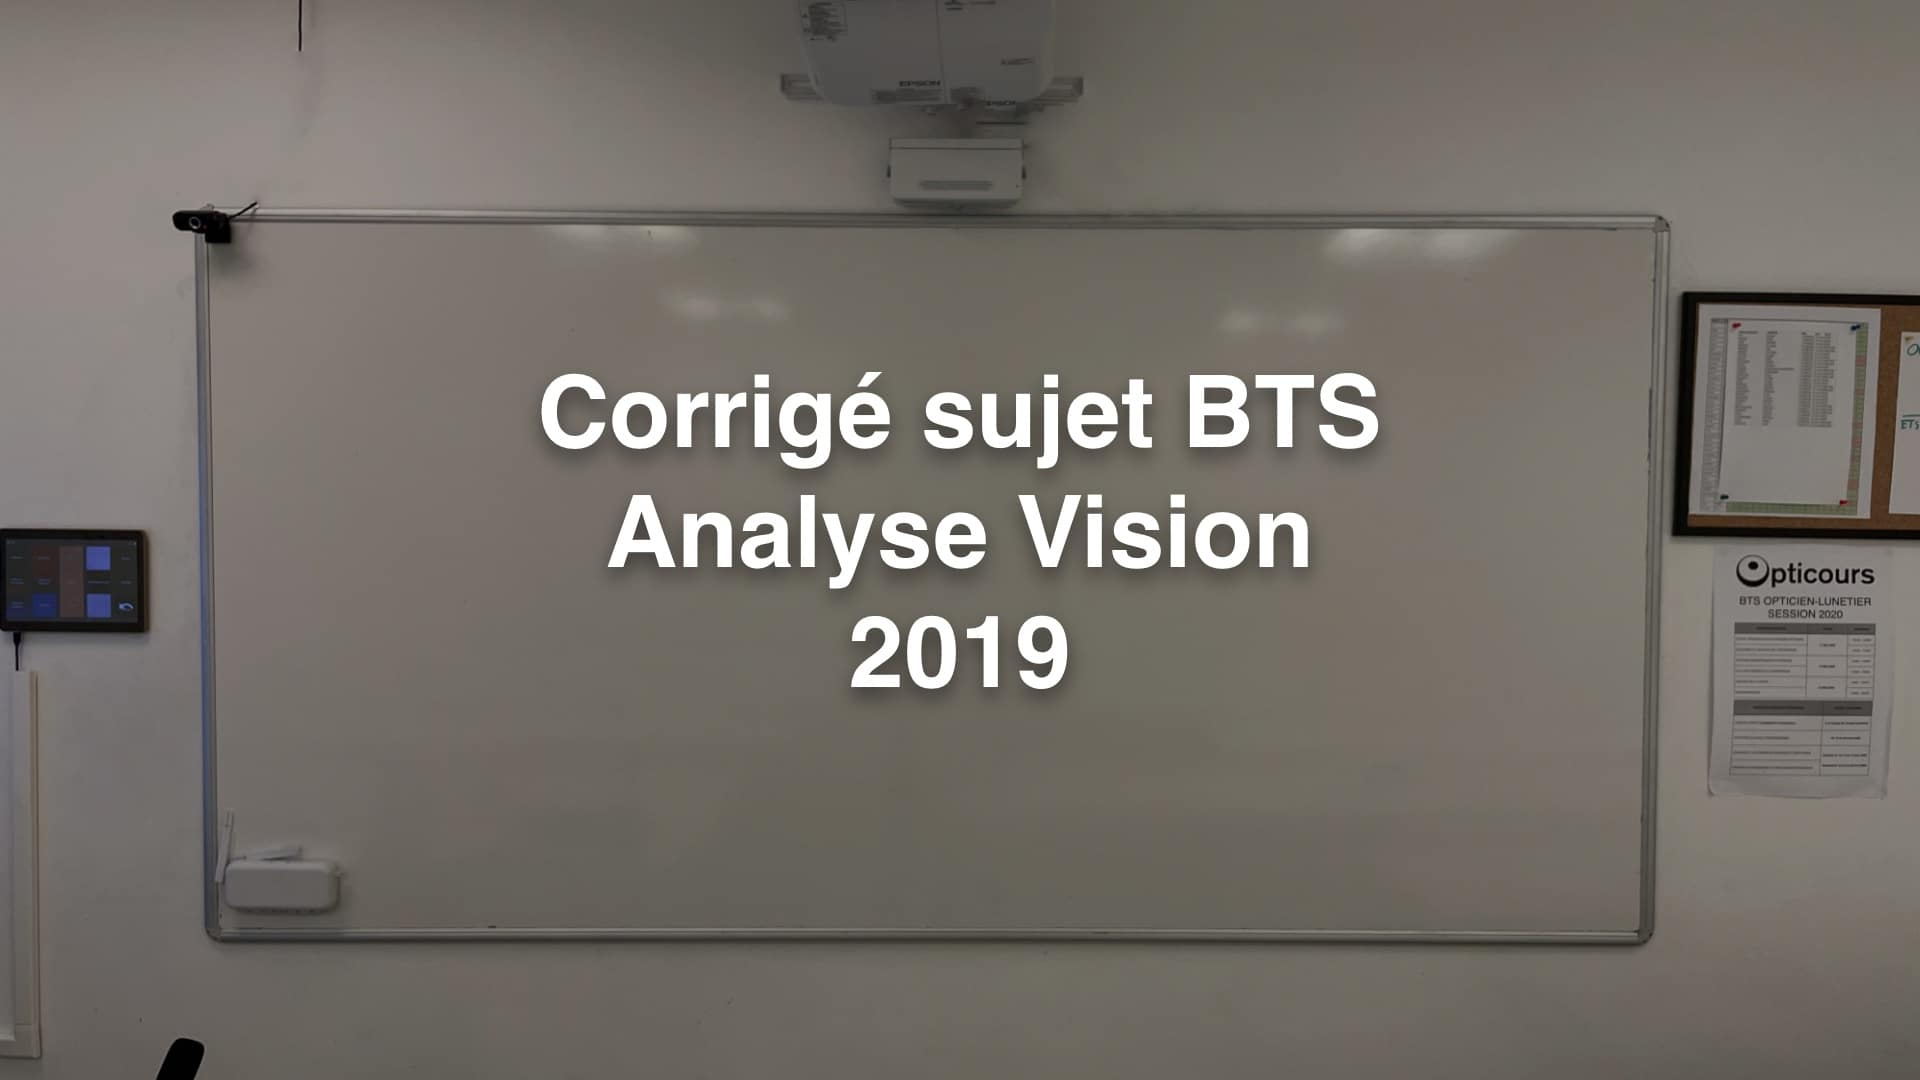 Corrigé sujet BTS Analyse Vision 2019